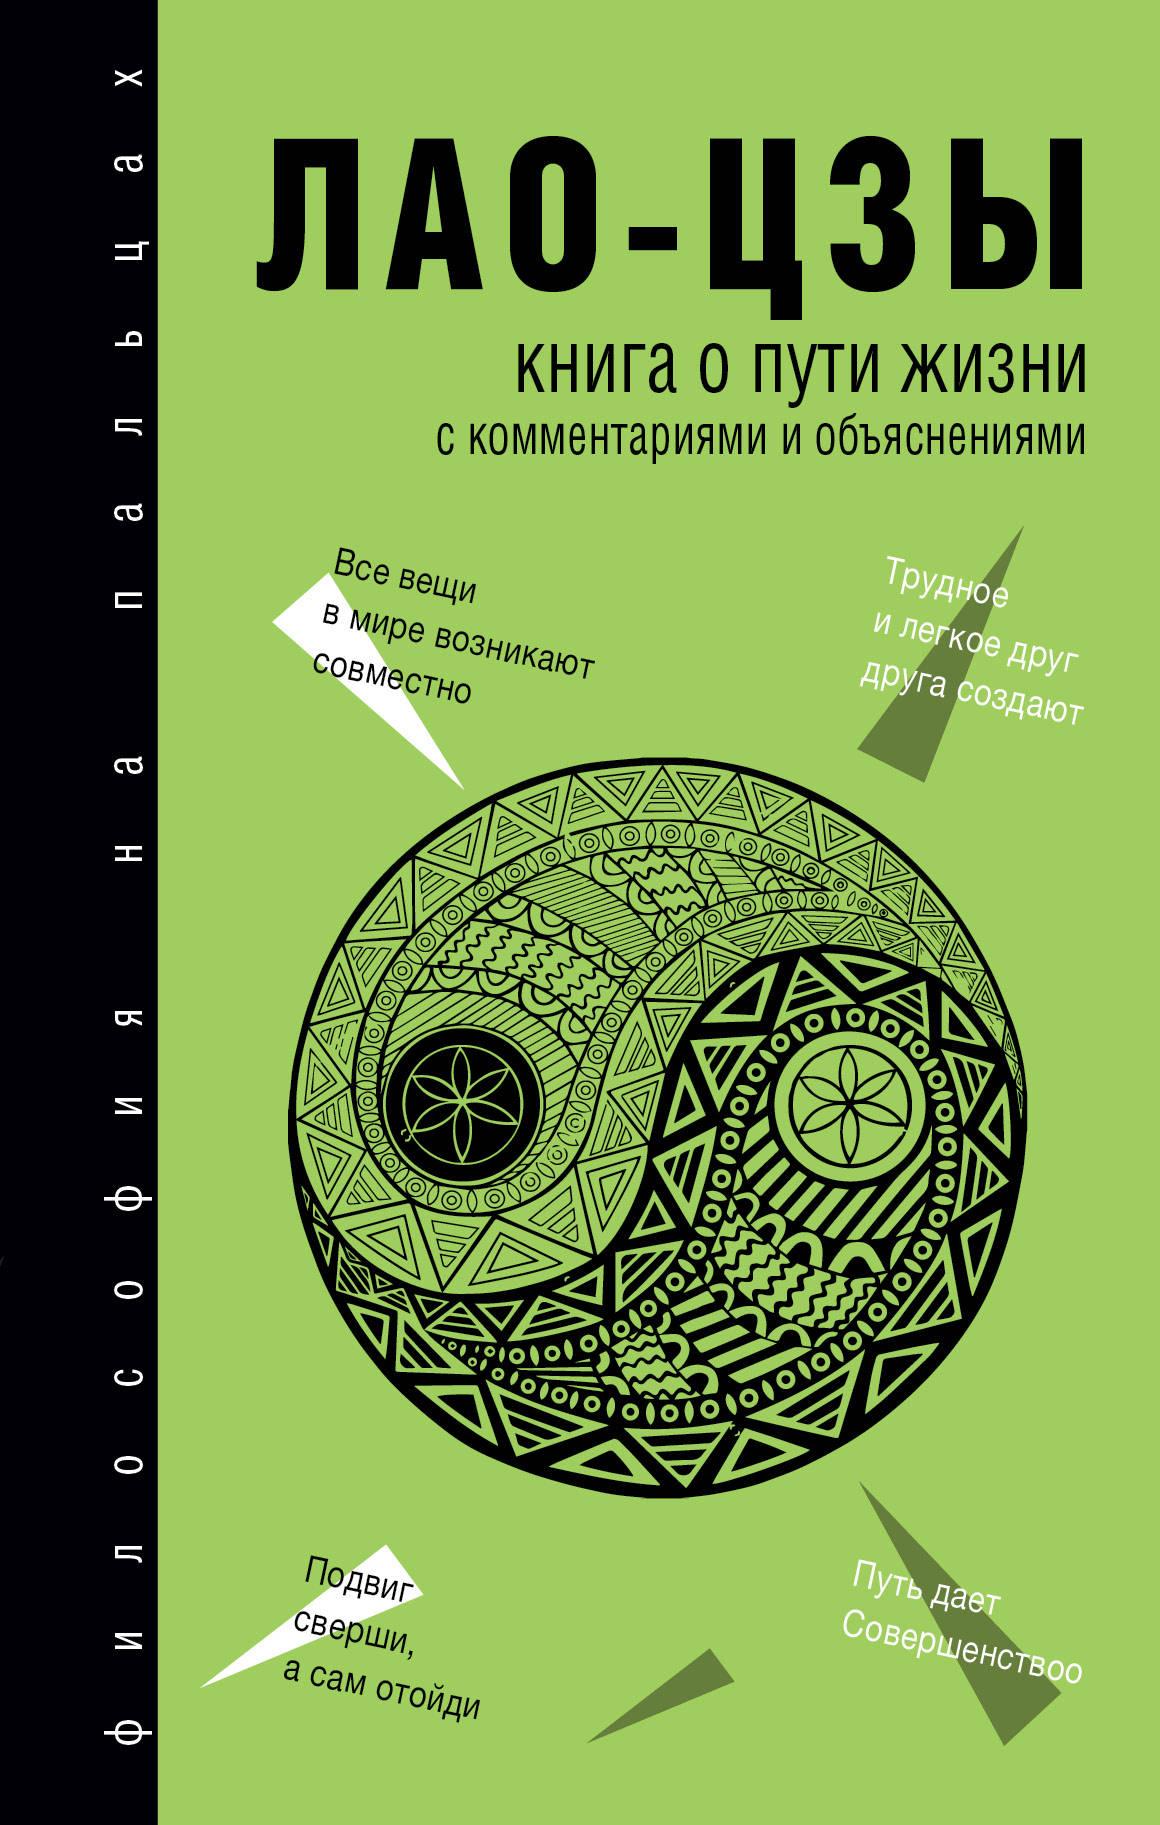 Лао-Цзы Книга о Пути жизни лао цзы книга о пути жизни дао дэ цзин с комментариями и объяснениями